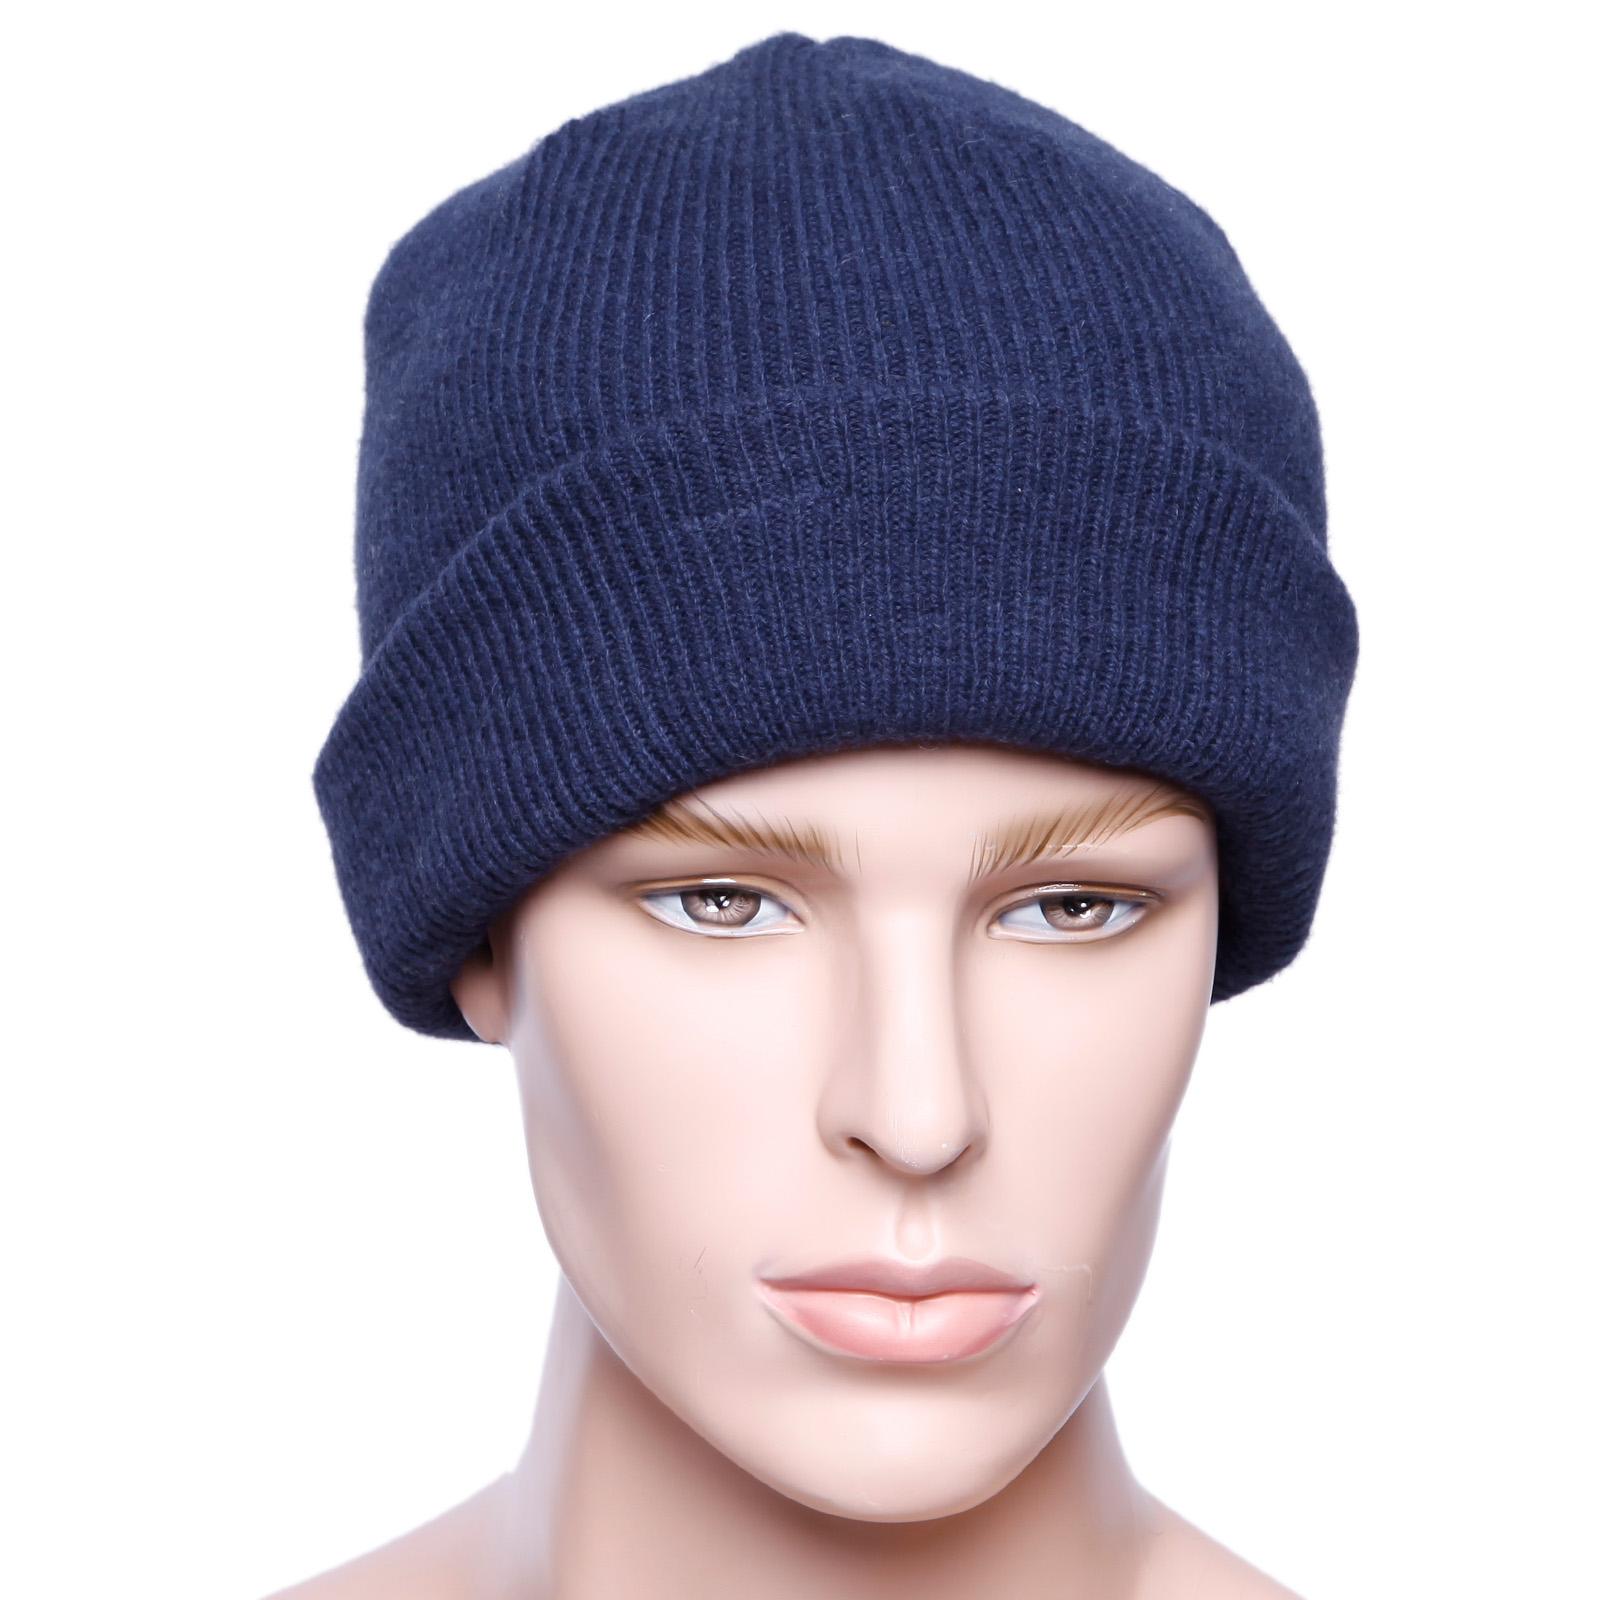 8be4f875d54f7 Gorro Tejido 100% Lana para Hombre Negro Azul Gris Casual para Otoño  Invierno